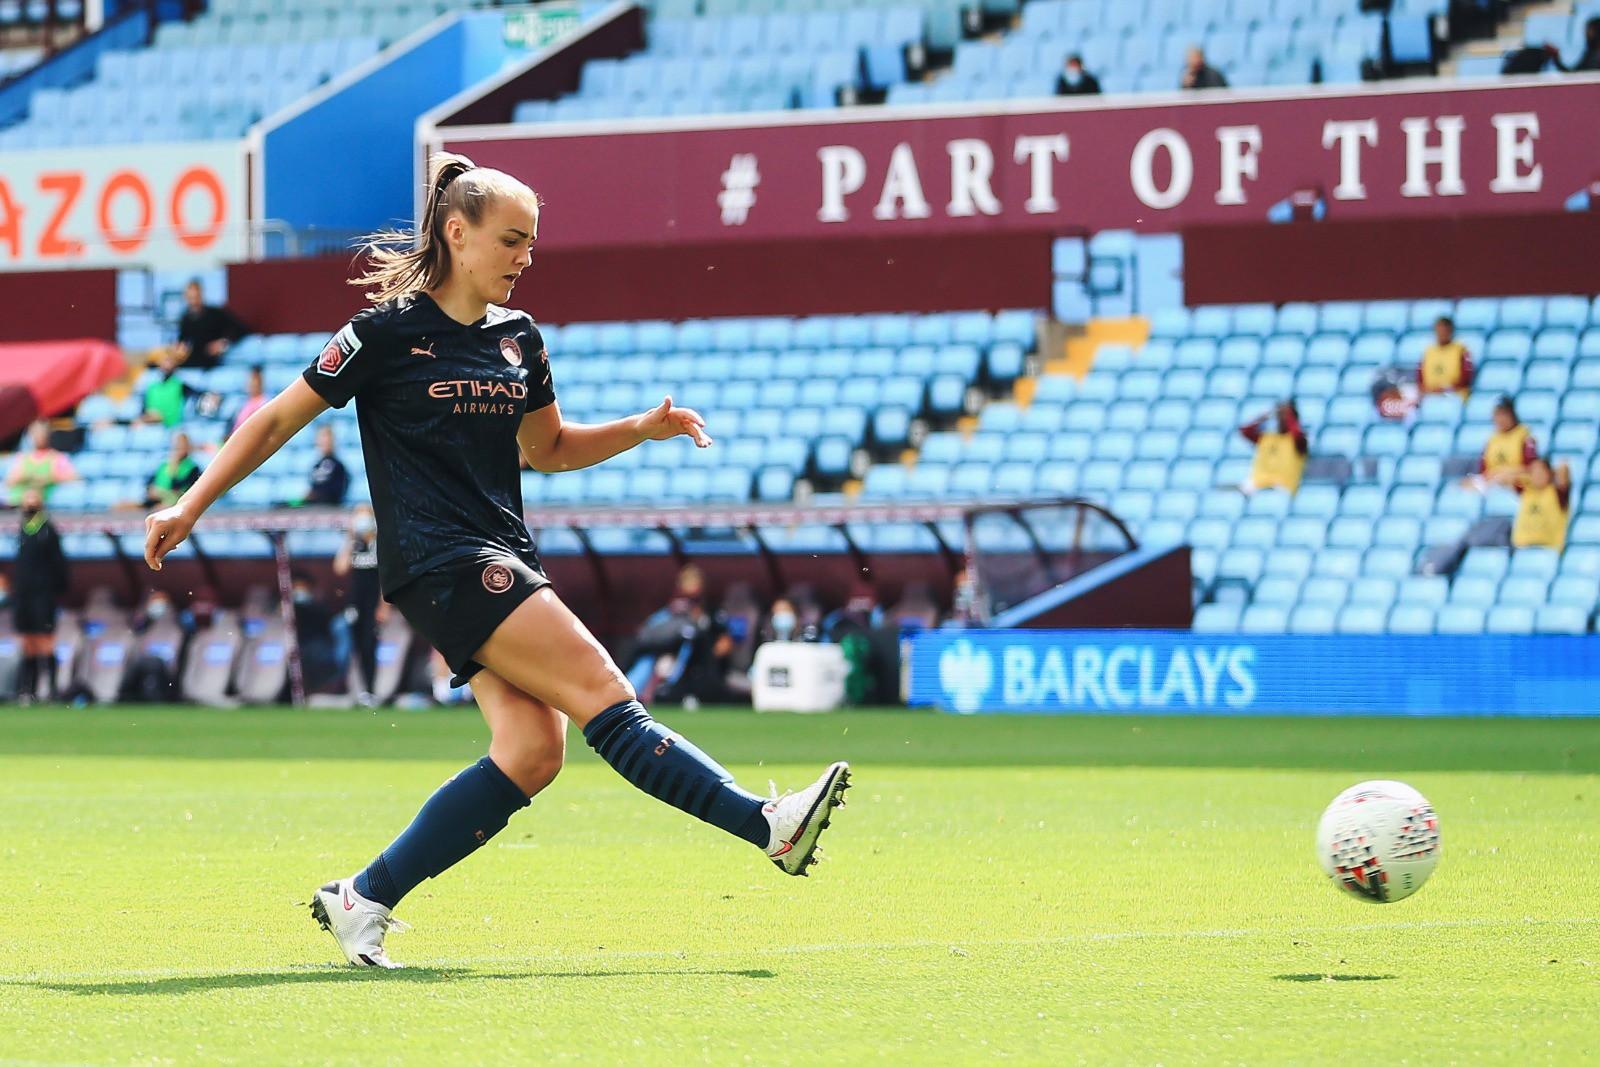 STANWAY. : Arrancó la temporada anotando dos goles en Villa Park.